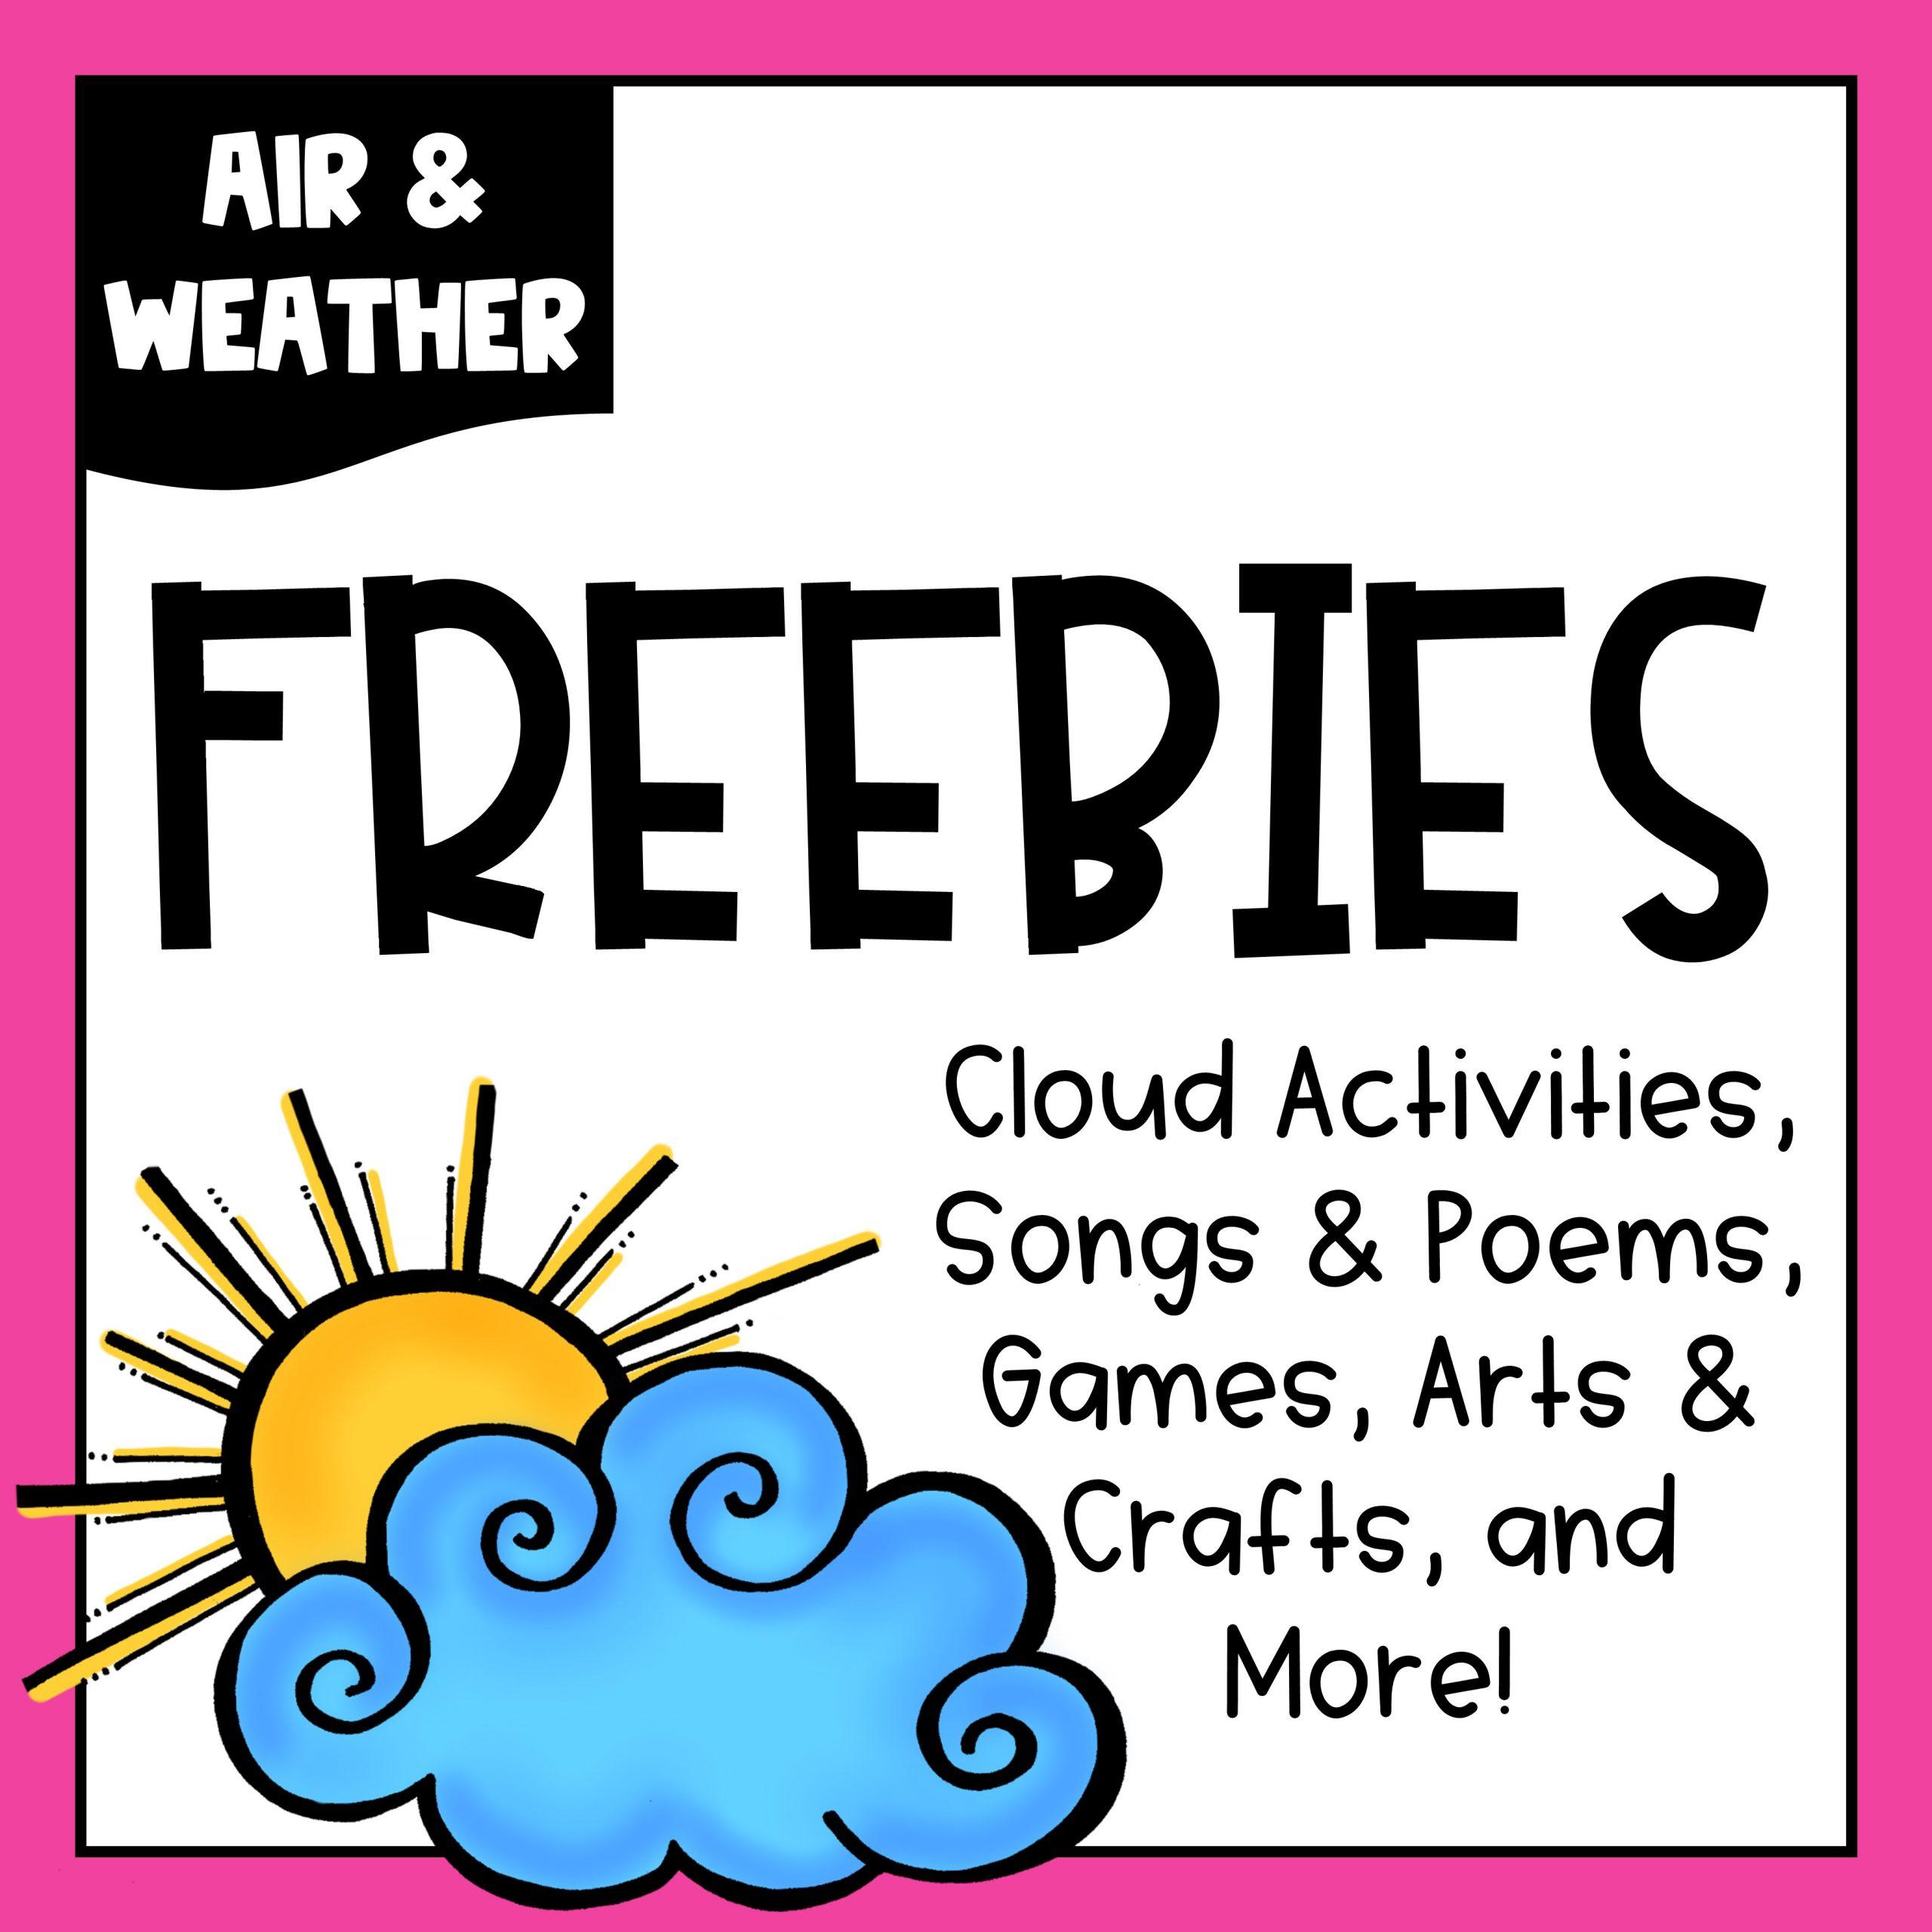 medium resolution of Air \u0026 Weather Freebies